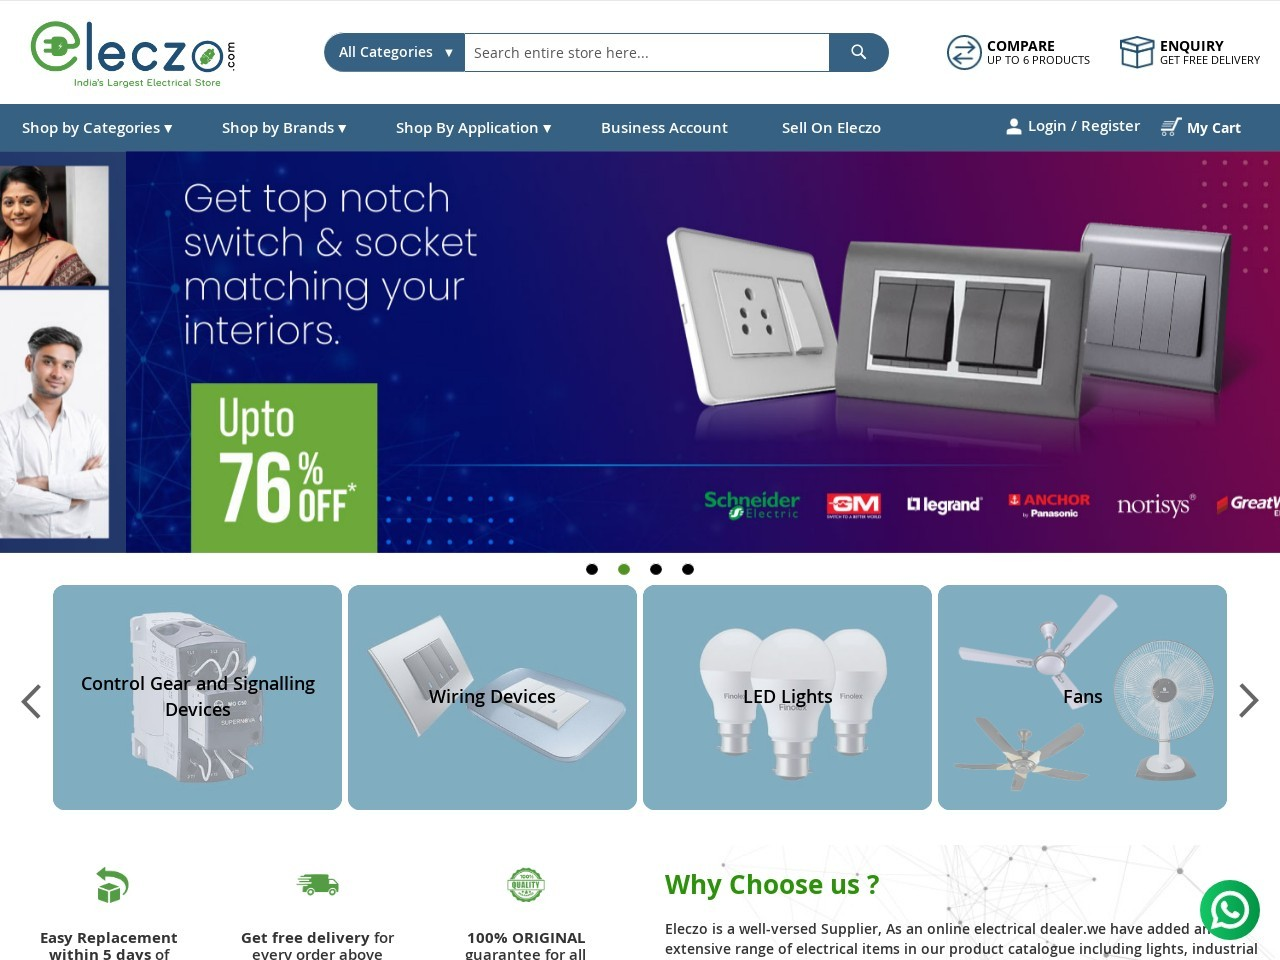 Buy Siemens 5SL51407RC 1 Pole 40 Amp MCB at Online |Eleczo.com